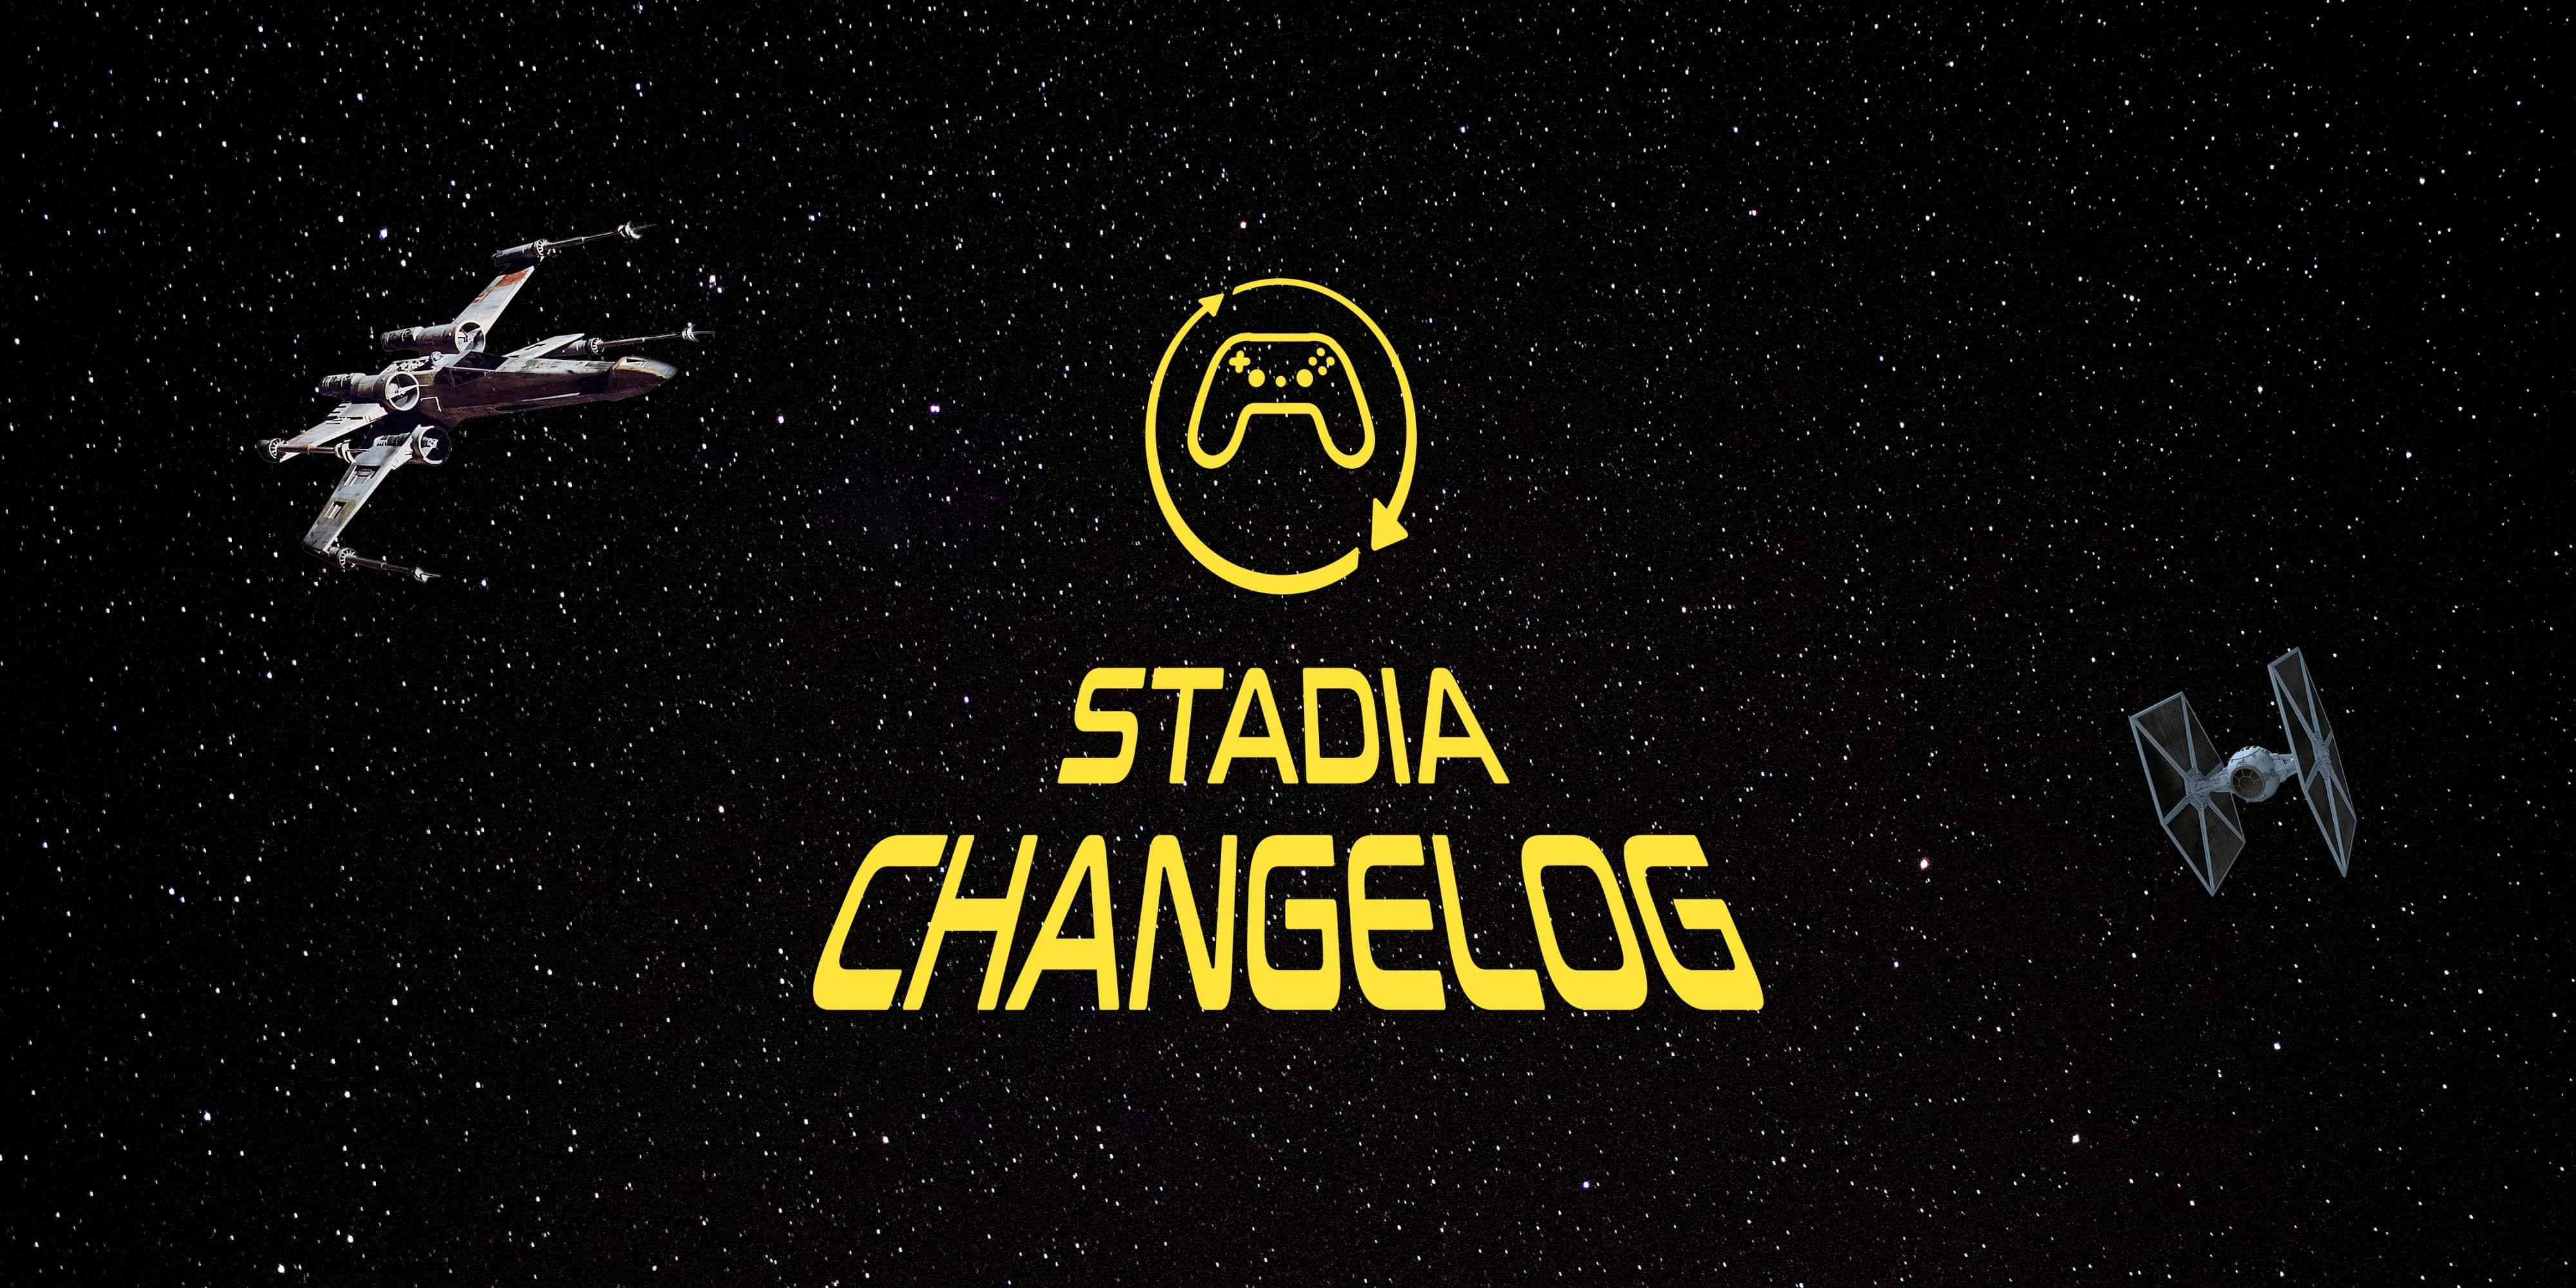 Stadia Changelog: Ubisoft is making a Star Wars game, Immortals and Valhalla updates, more